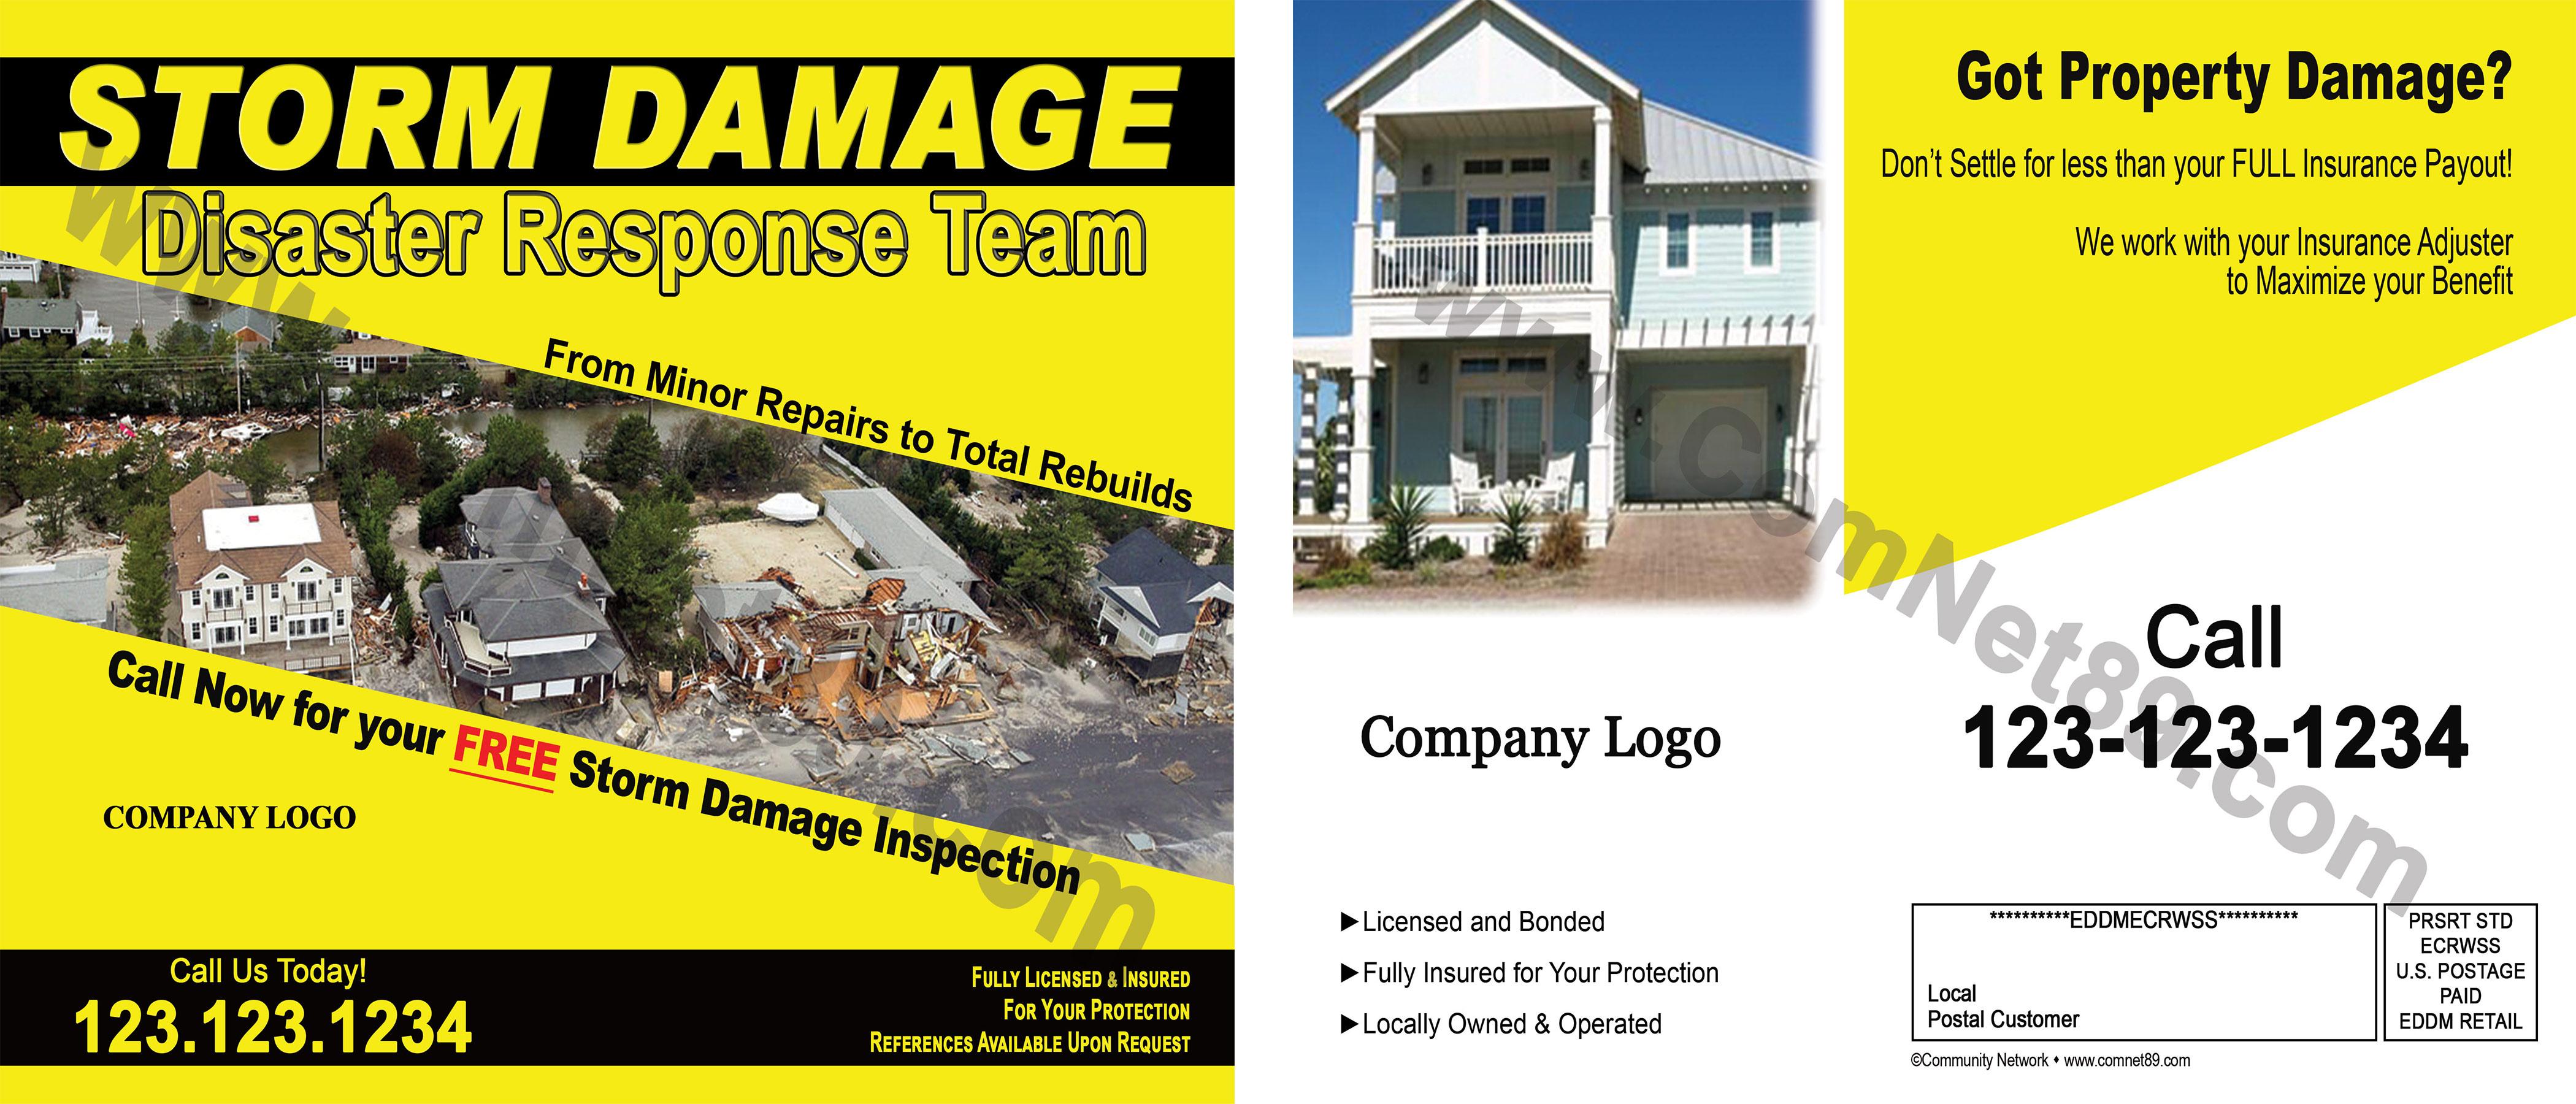 Storm Damage Postcard